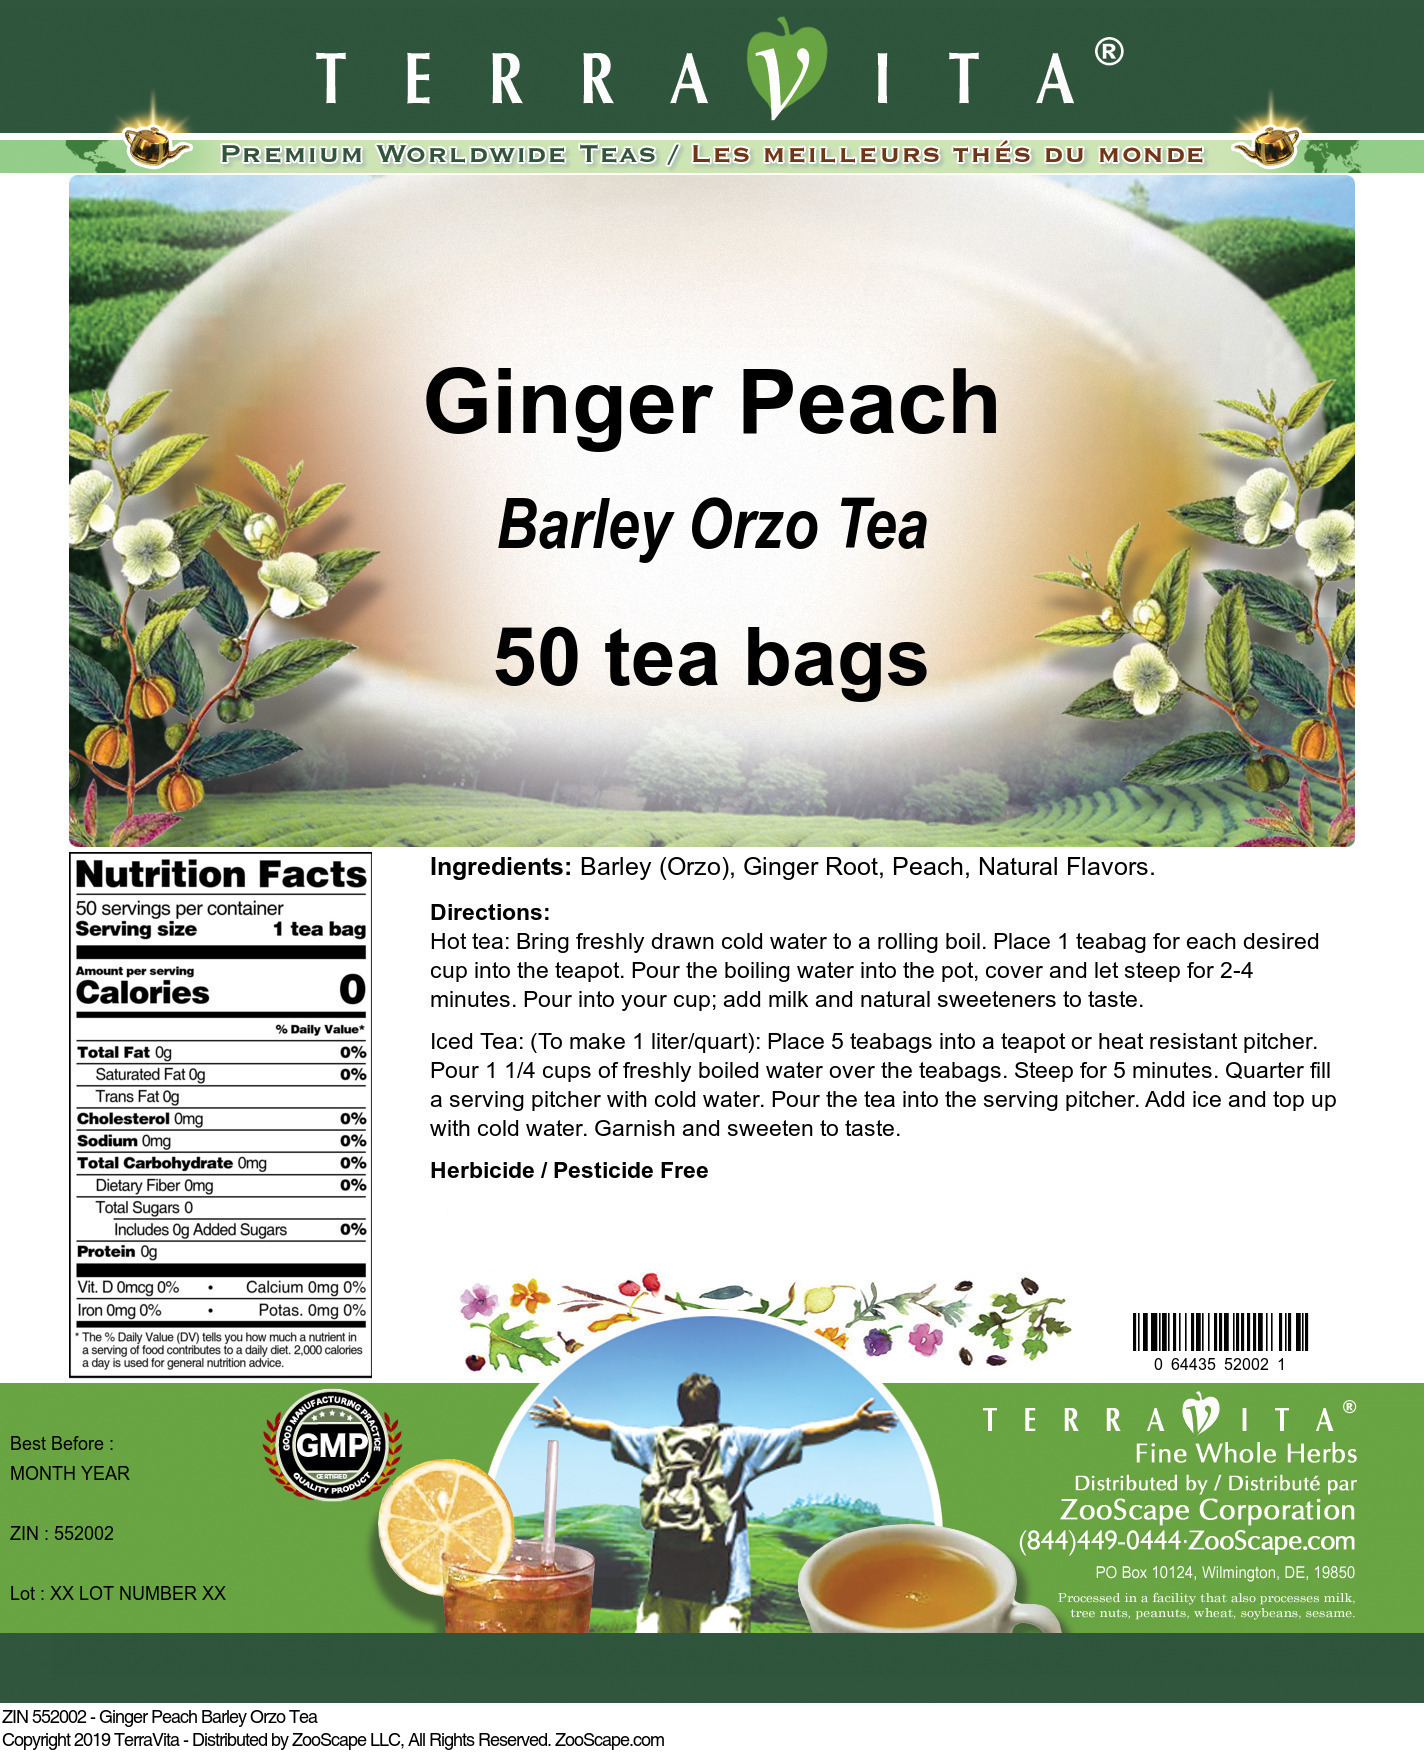 Ginger Peach Barley Orzo